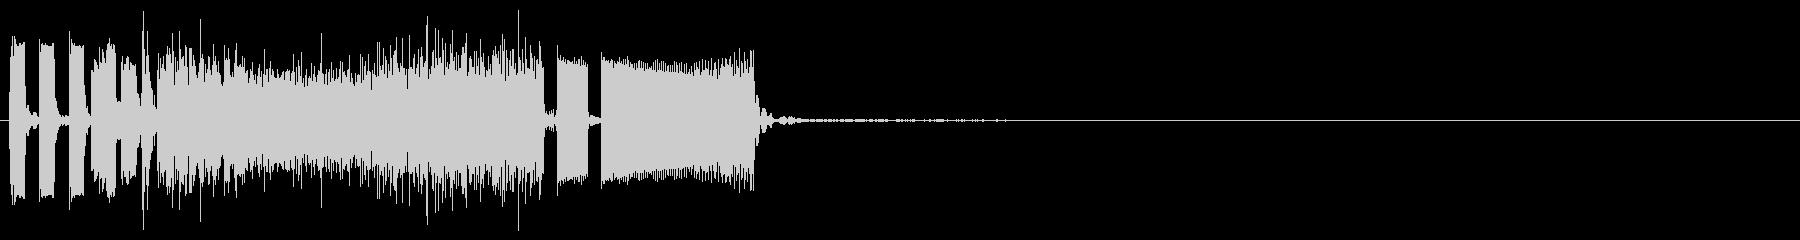 ElectrostaticAcce...の未再生の波形